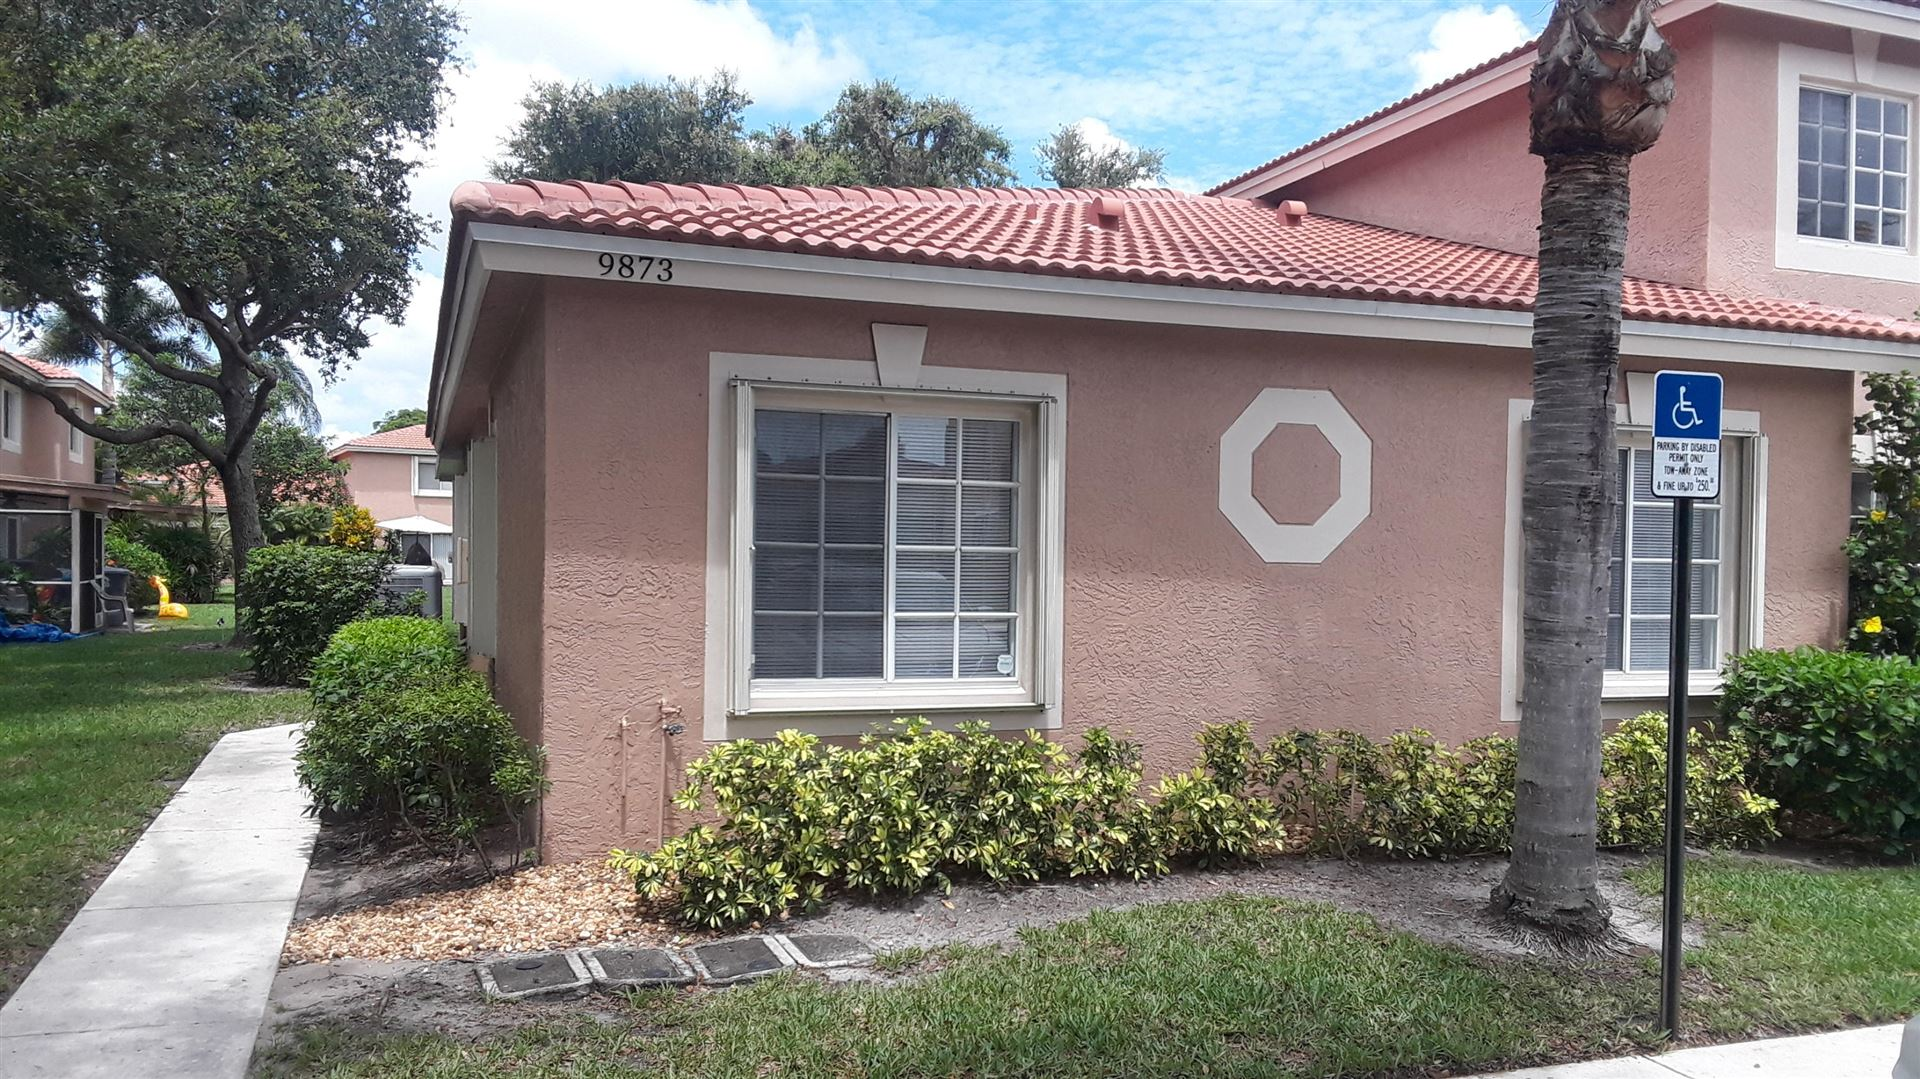 9873 Kamena Circle, Boynton Beach, FL 33436 - #: RX-10629229